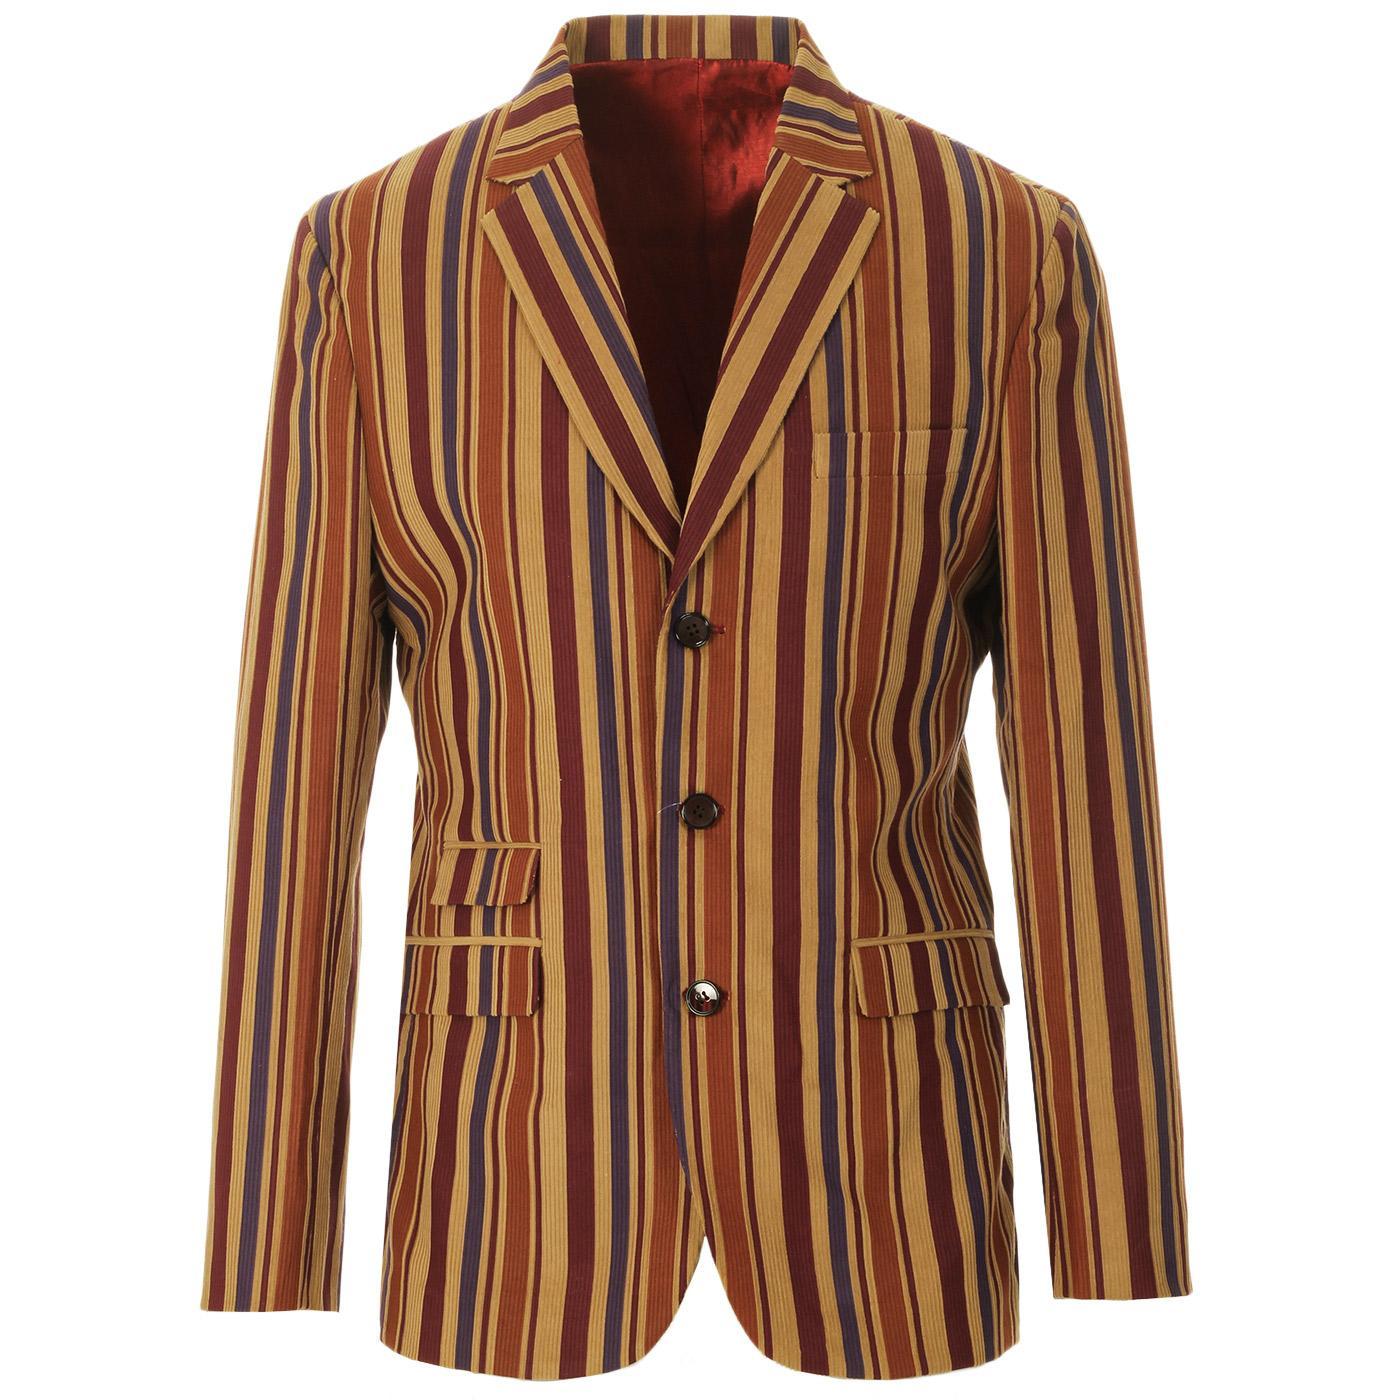 Offbeat Cord MADCAP ENGLAND Mod Stripe Blazer (C)